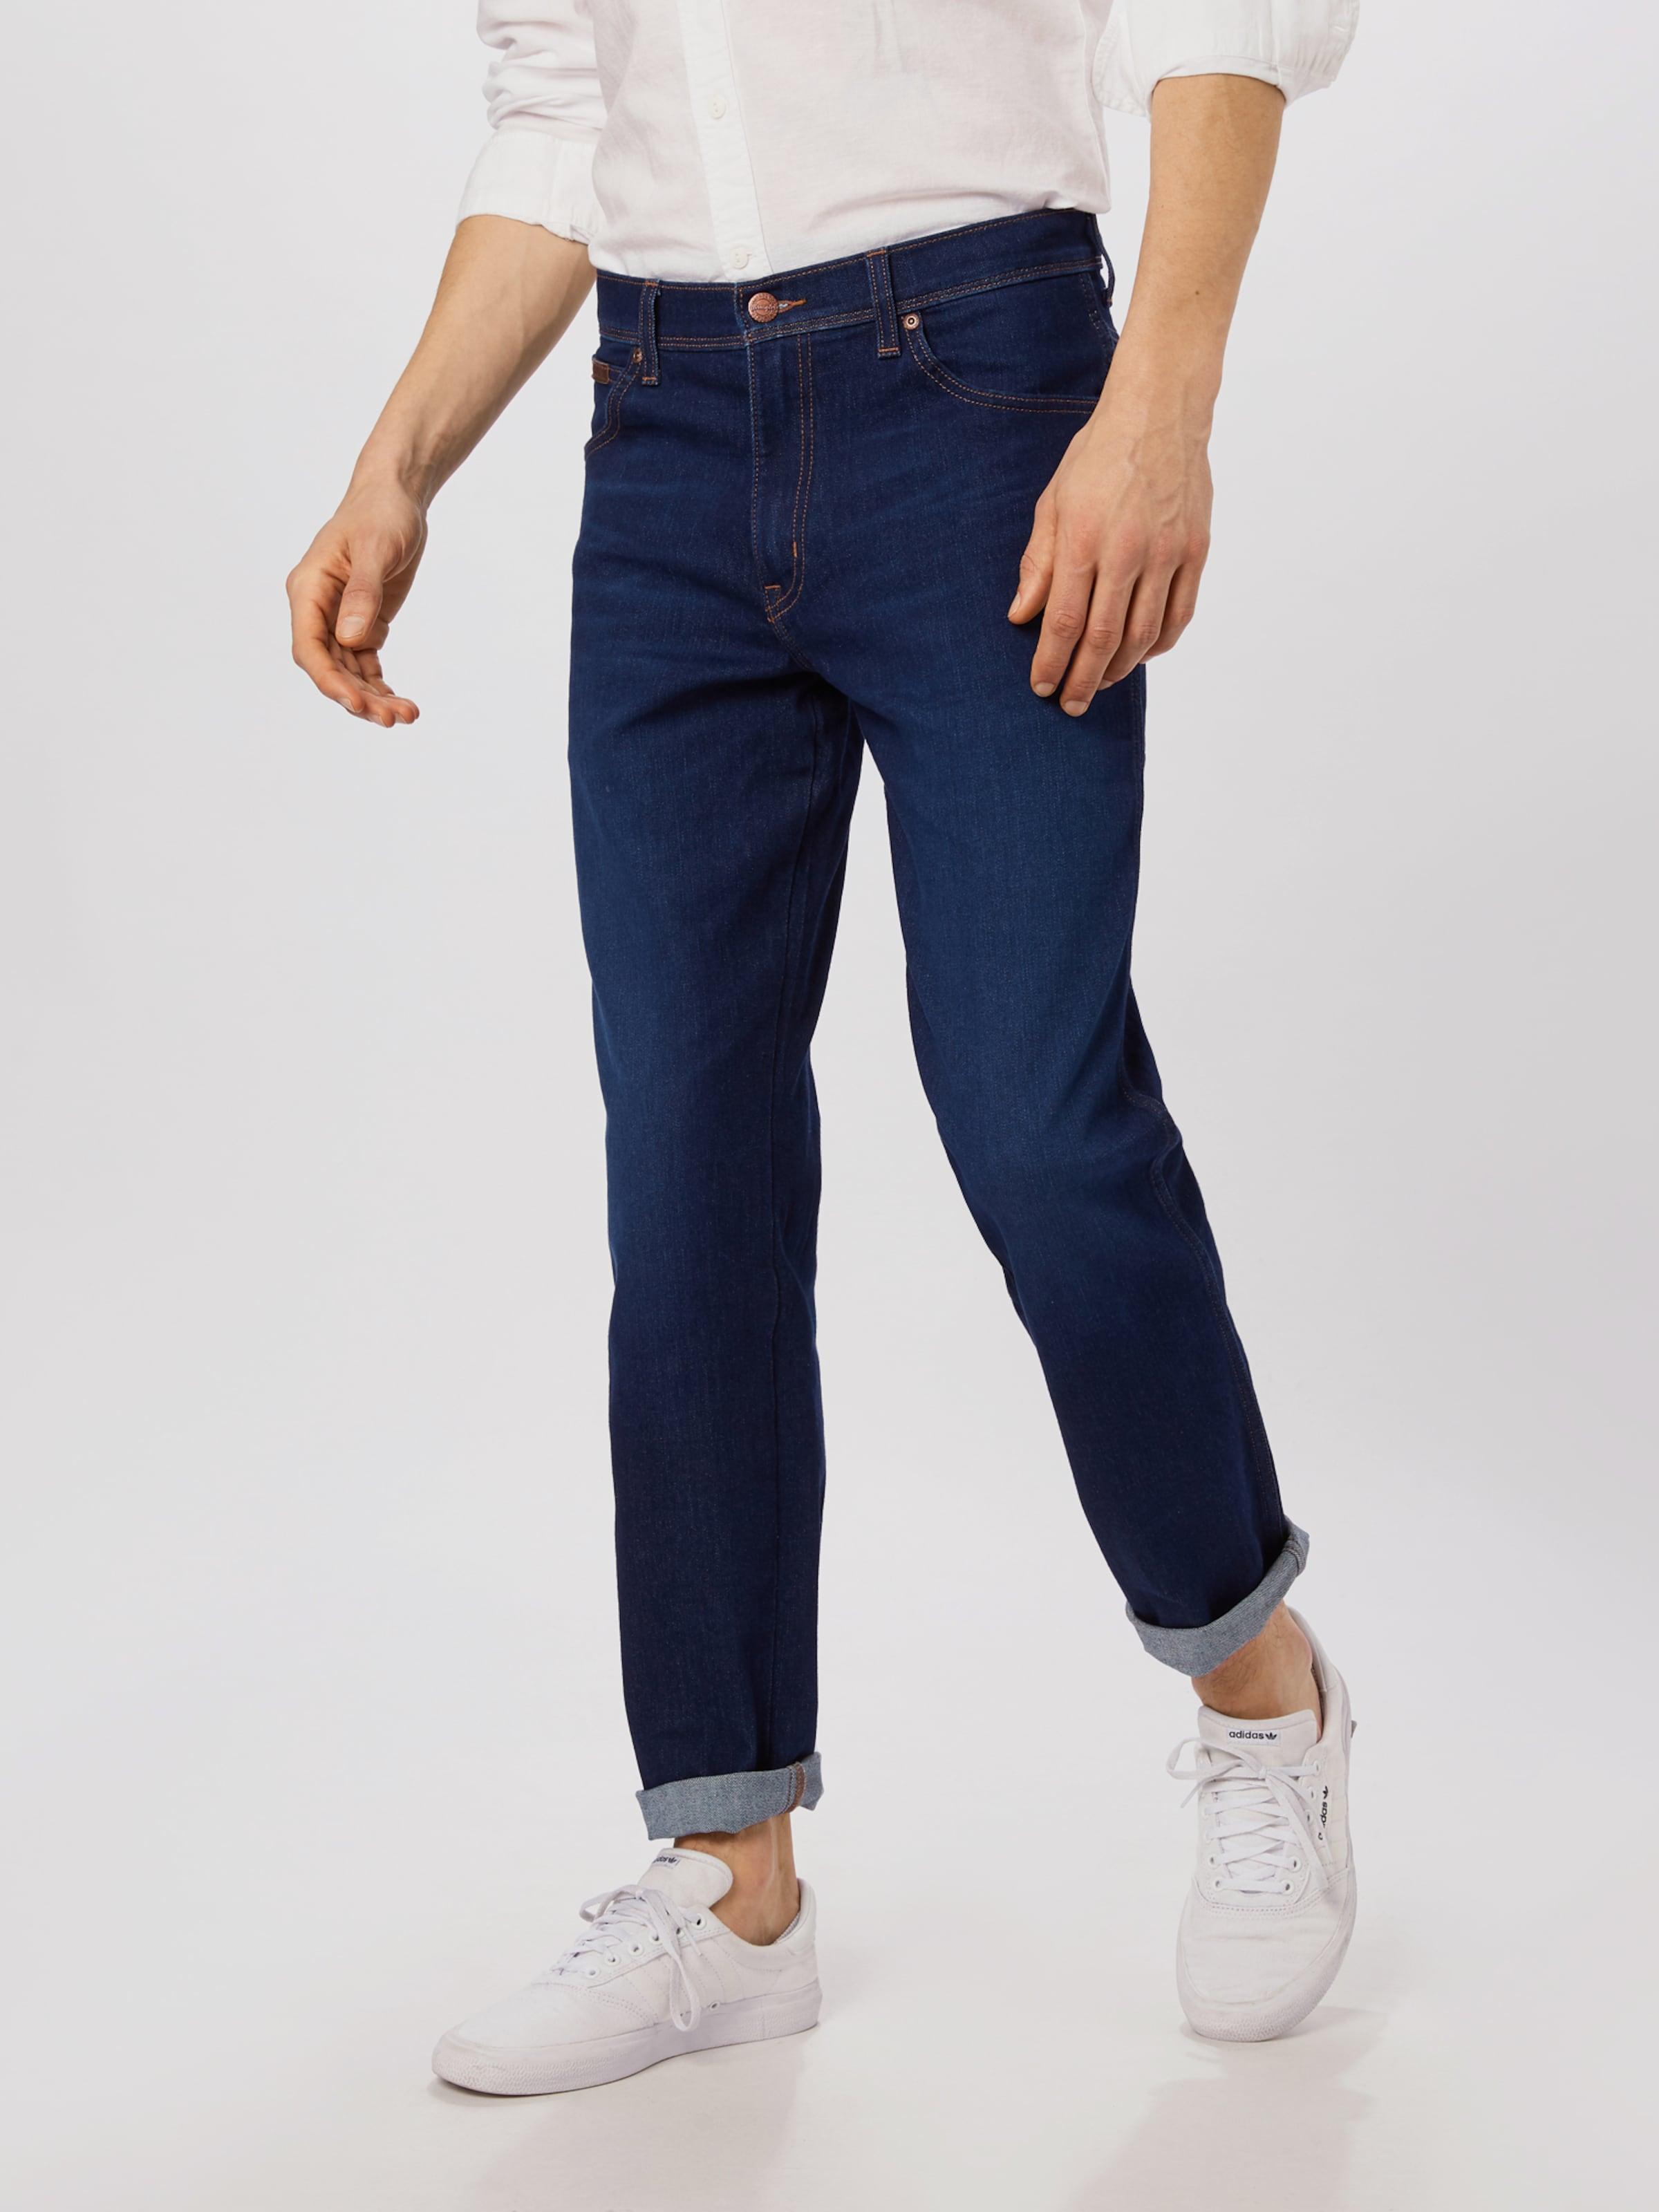 WRANGLER Jeans 'Texas' in blue denim Unifarben WRA0133005000001